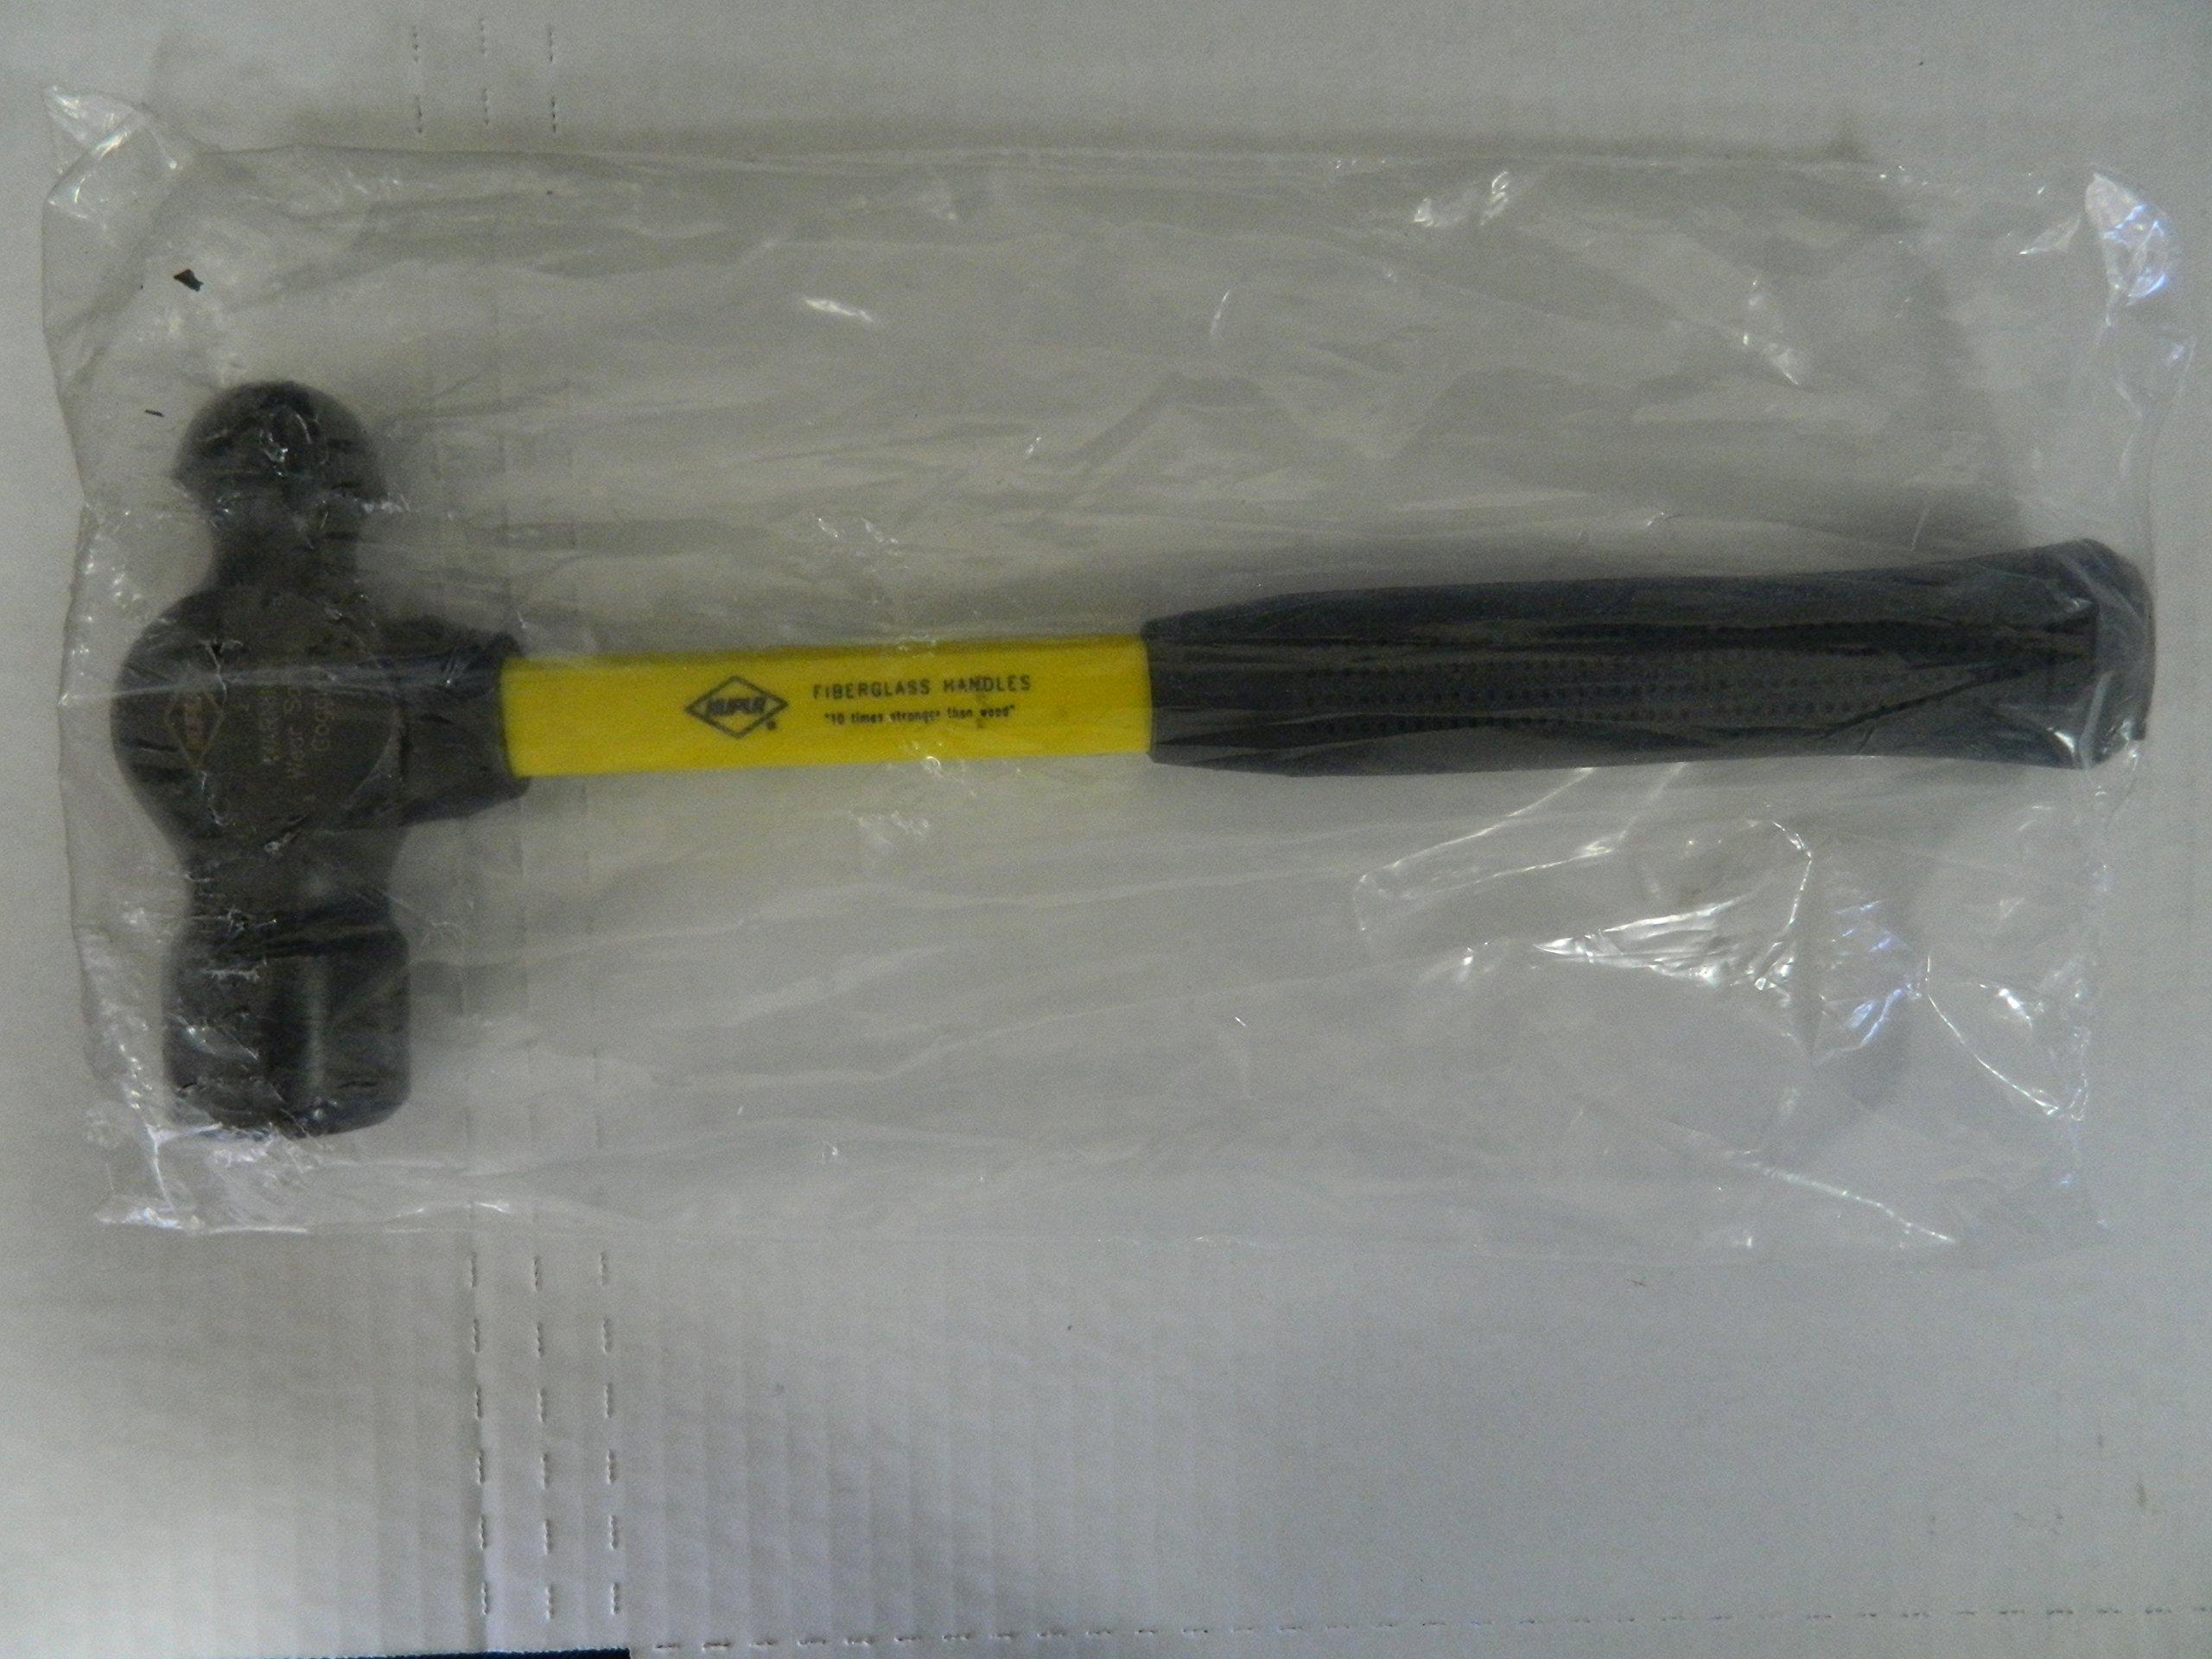 Nupla 32-Oz Cylindrical Flat Face Round Head Fiberglass Ergonomic Nonslip Hammer